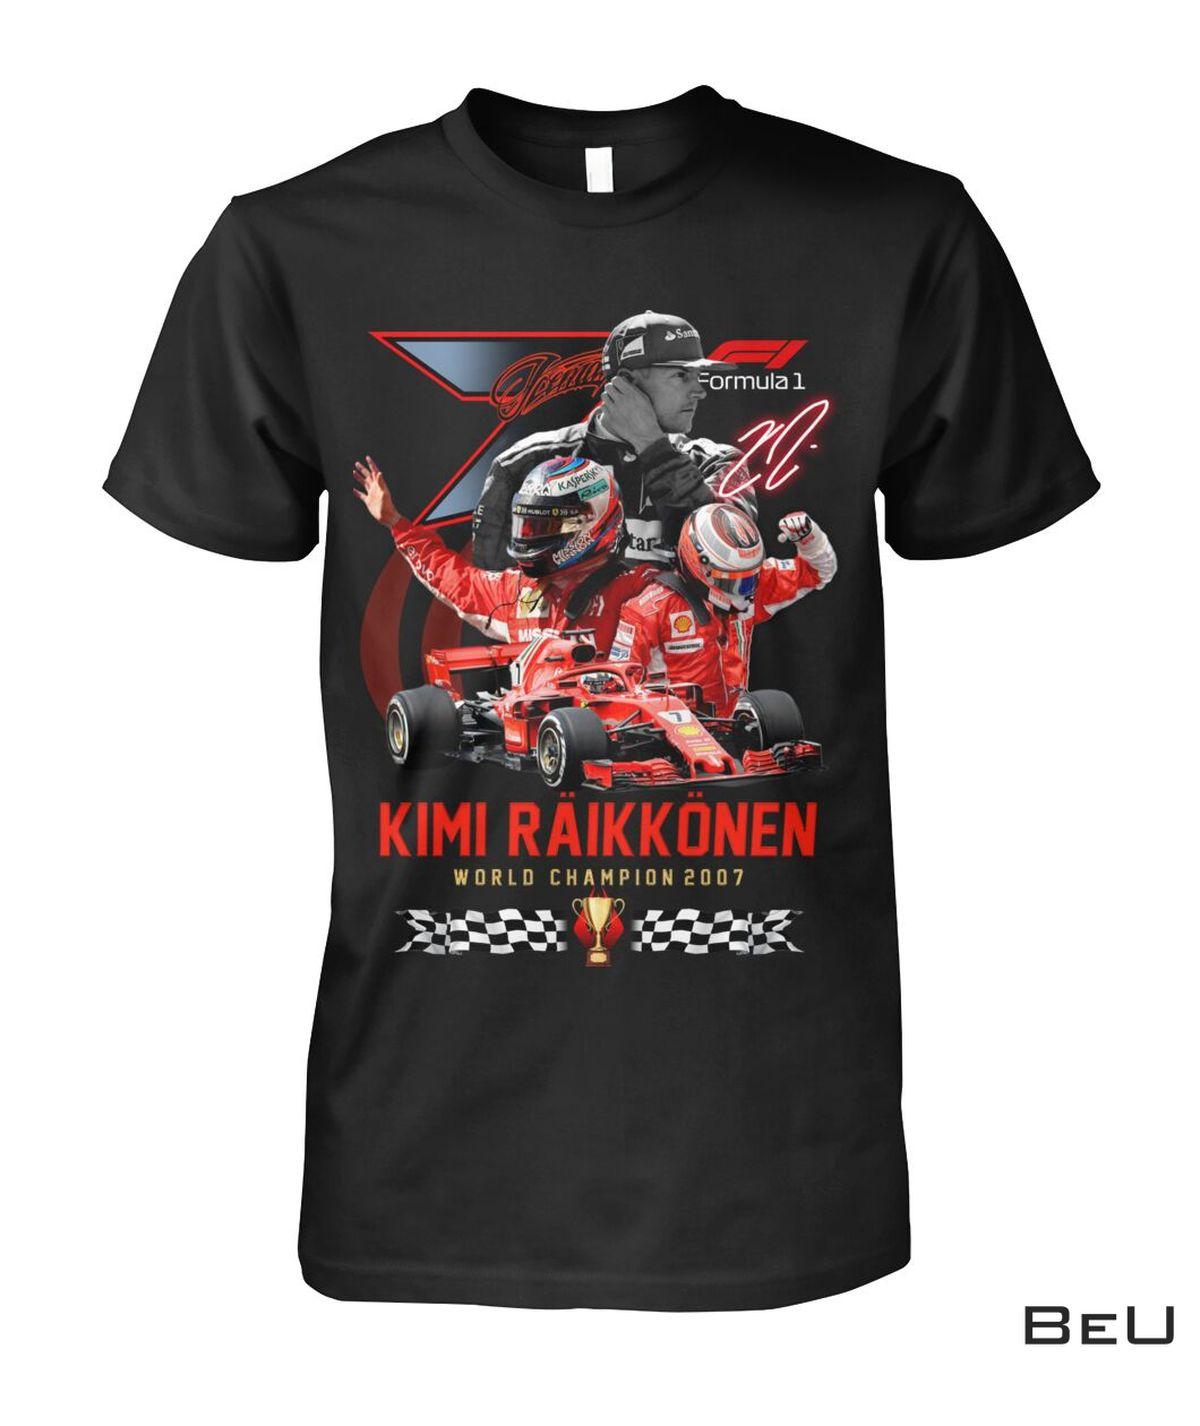 Kimi Raikkonen World Champion 2007 Shirt, hoodie, tank top